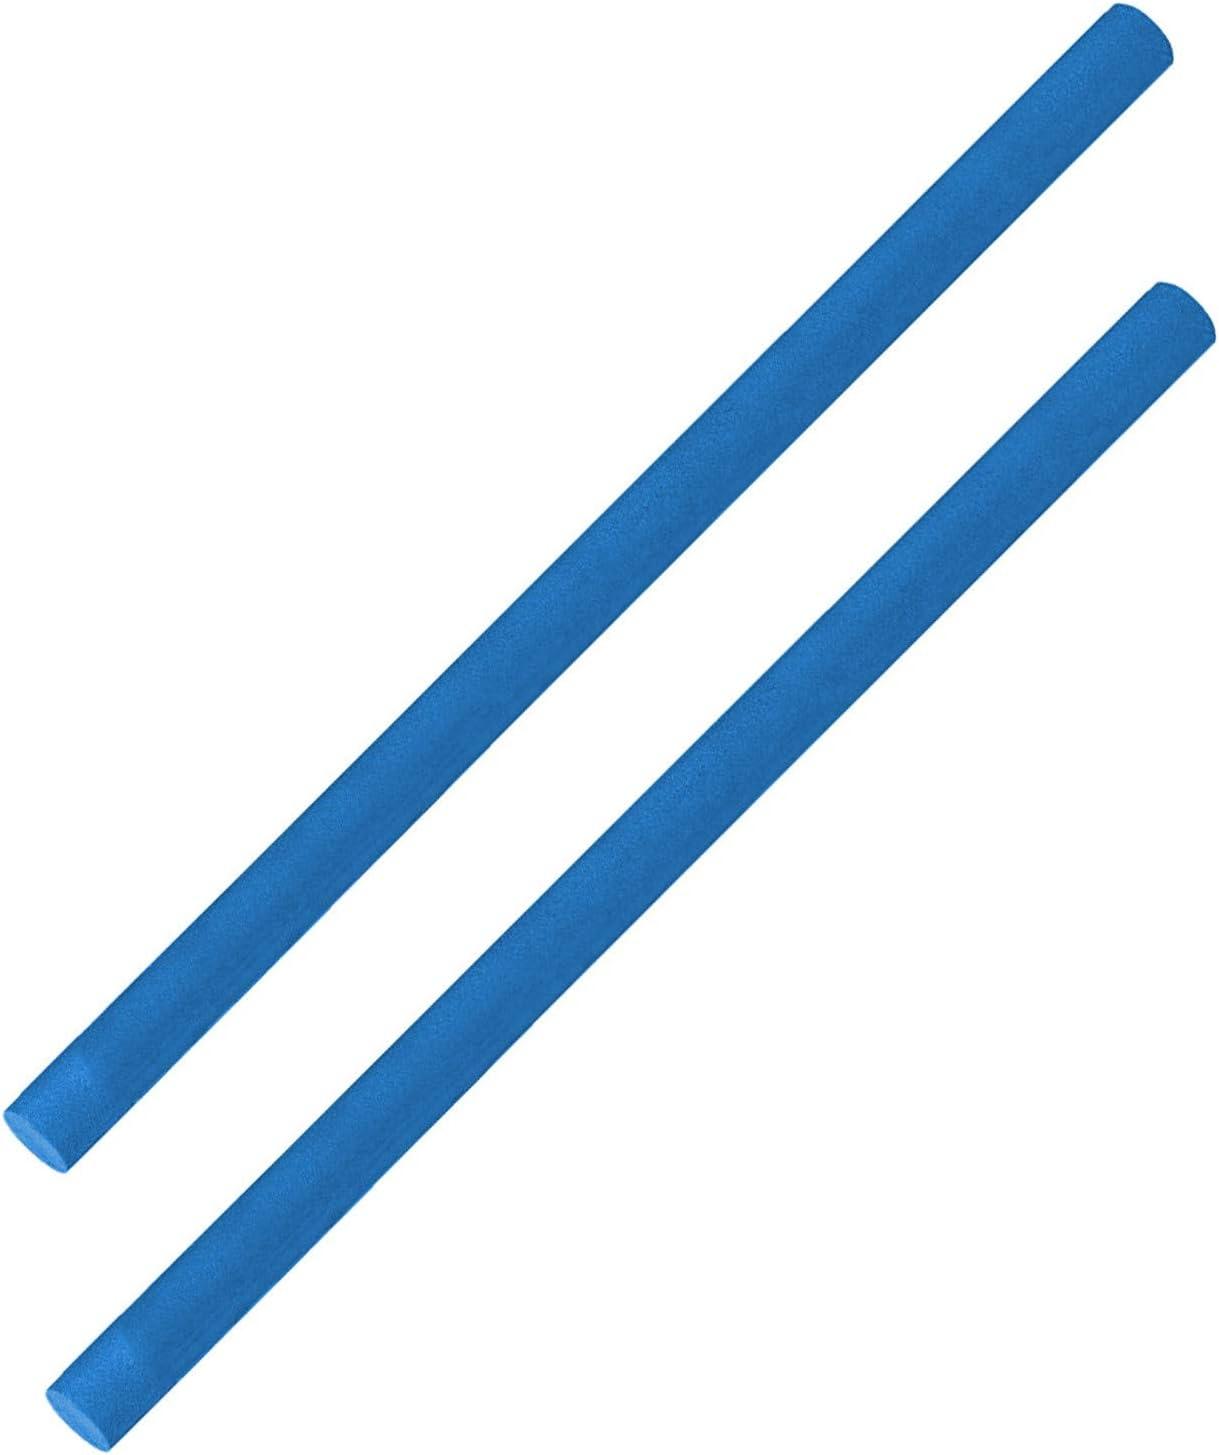 160 cm lang Blau, 1 Poolnudel COMFY Schwimmnudel Poolnudel /Ø 6,7 cm